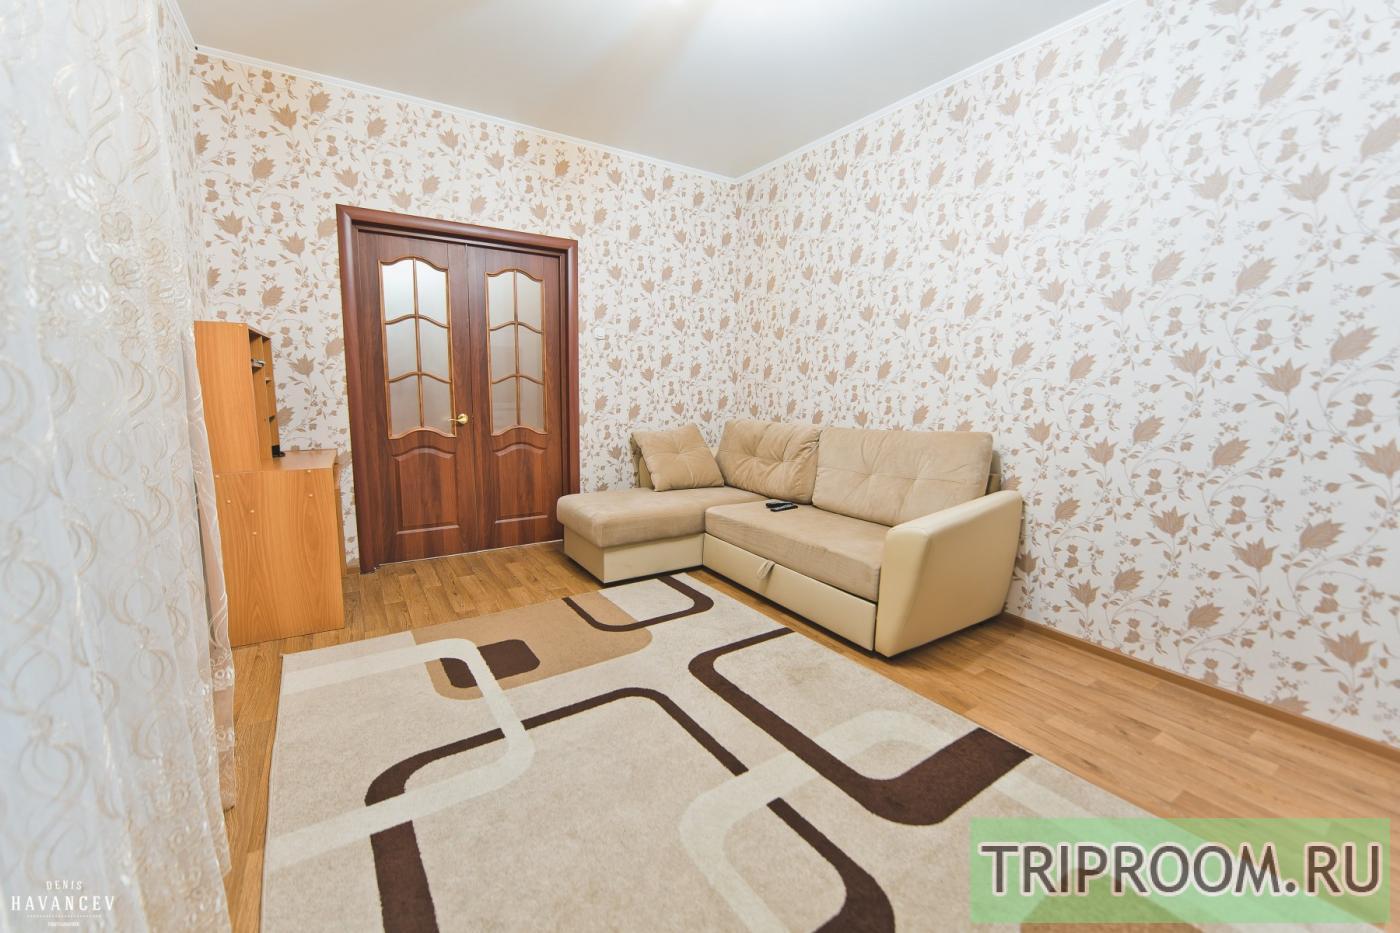 1-комнатная квартира посуточно (вариант № 14832), ул. Пугачева улица, фото № 8